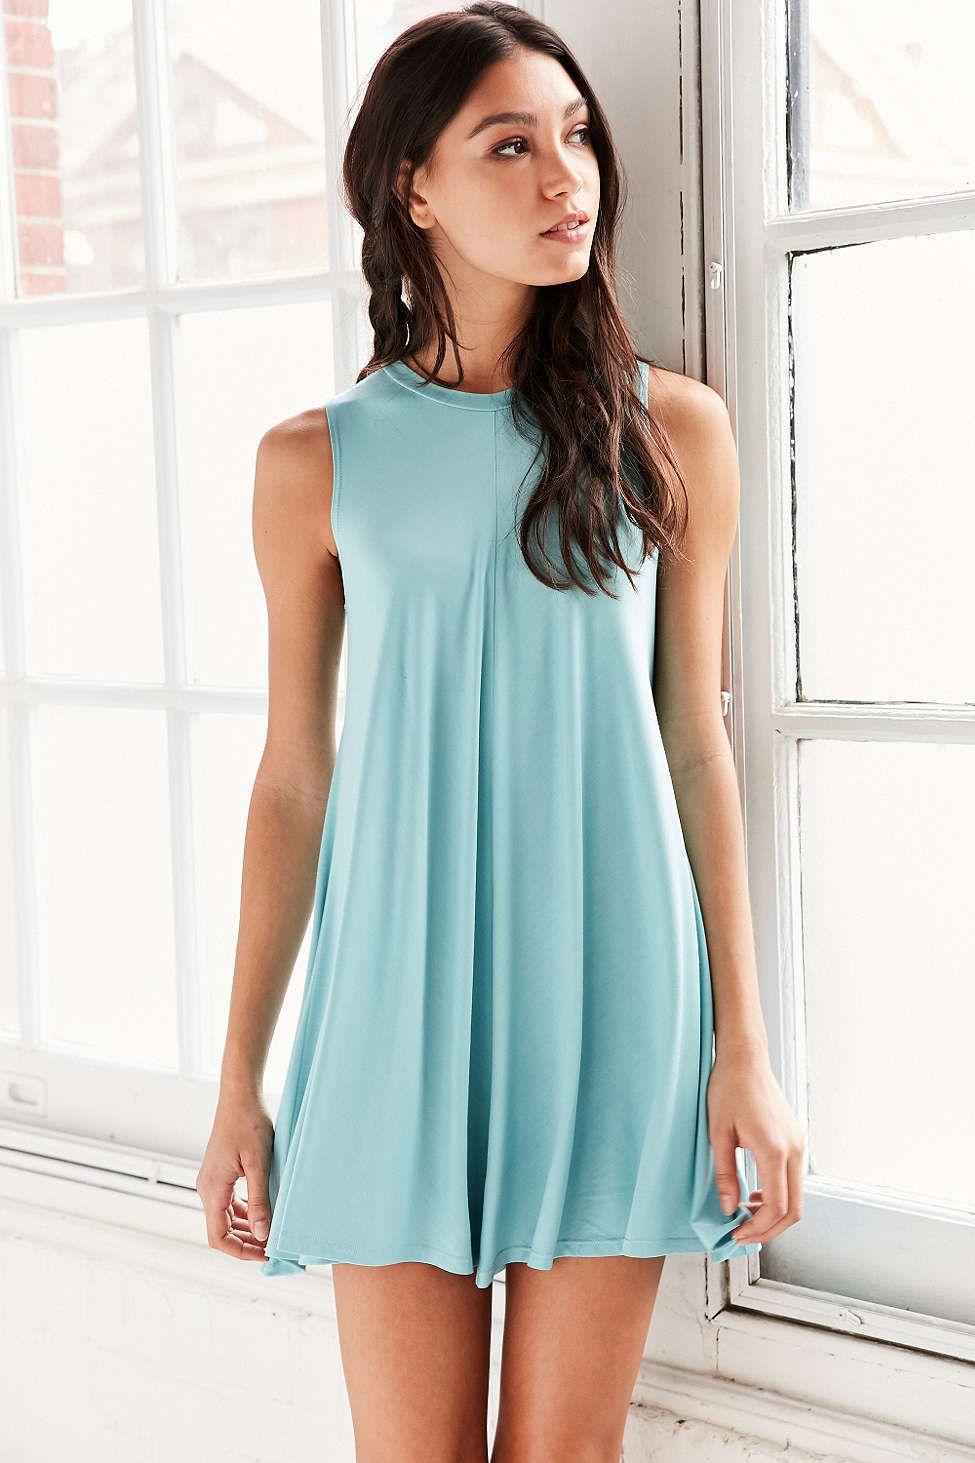 Silence + Noise Swingy Tank Dress | Tank dress, Urban outfitters ...